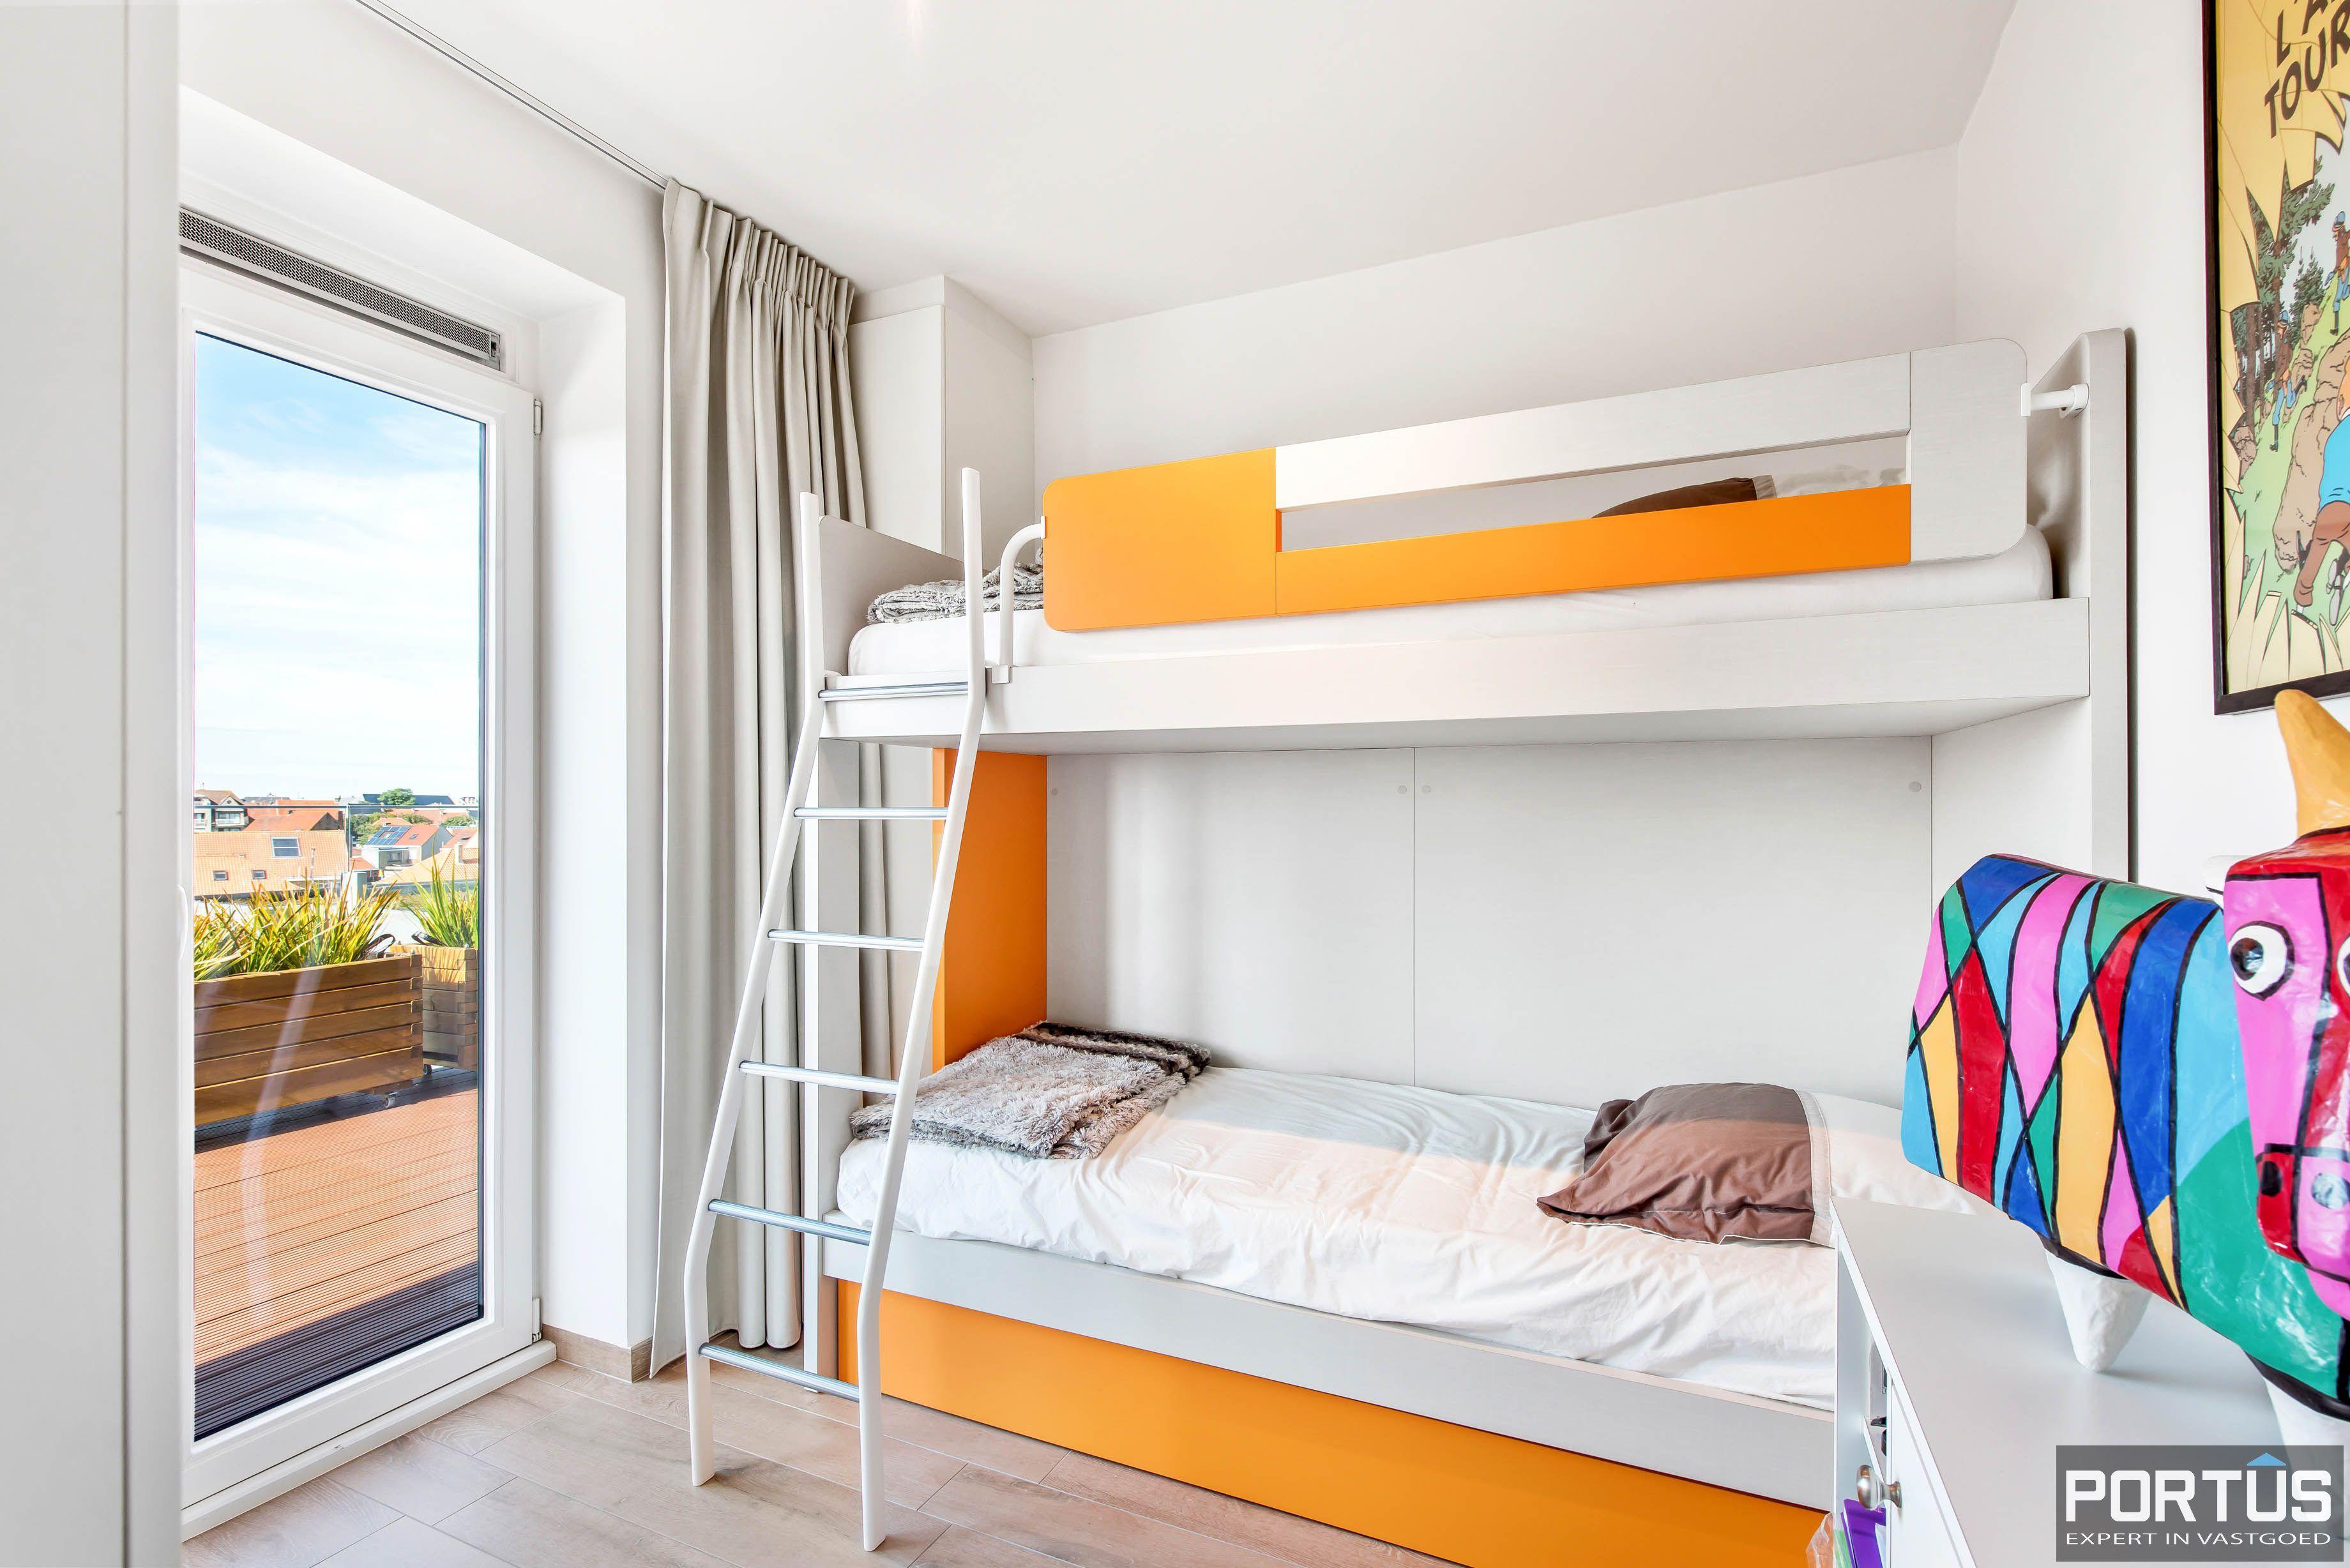 Exclusieve penthouse met 3 slaapkamers te koop te Nieuwpoort - 10926